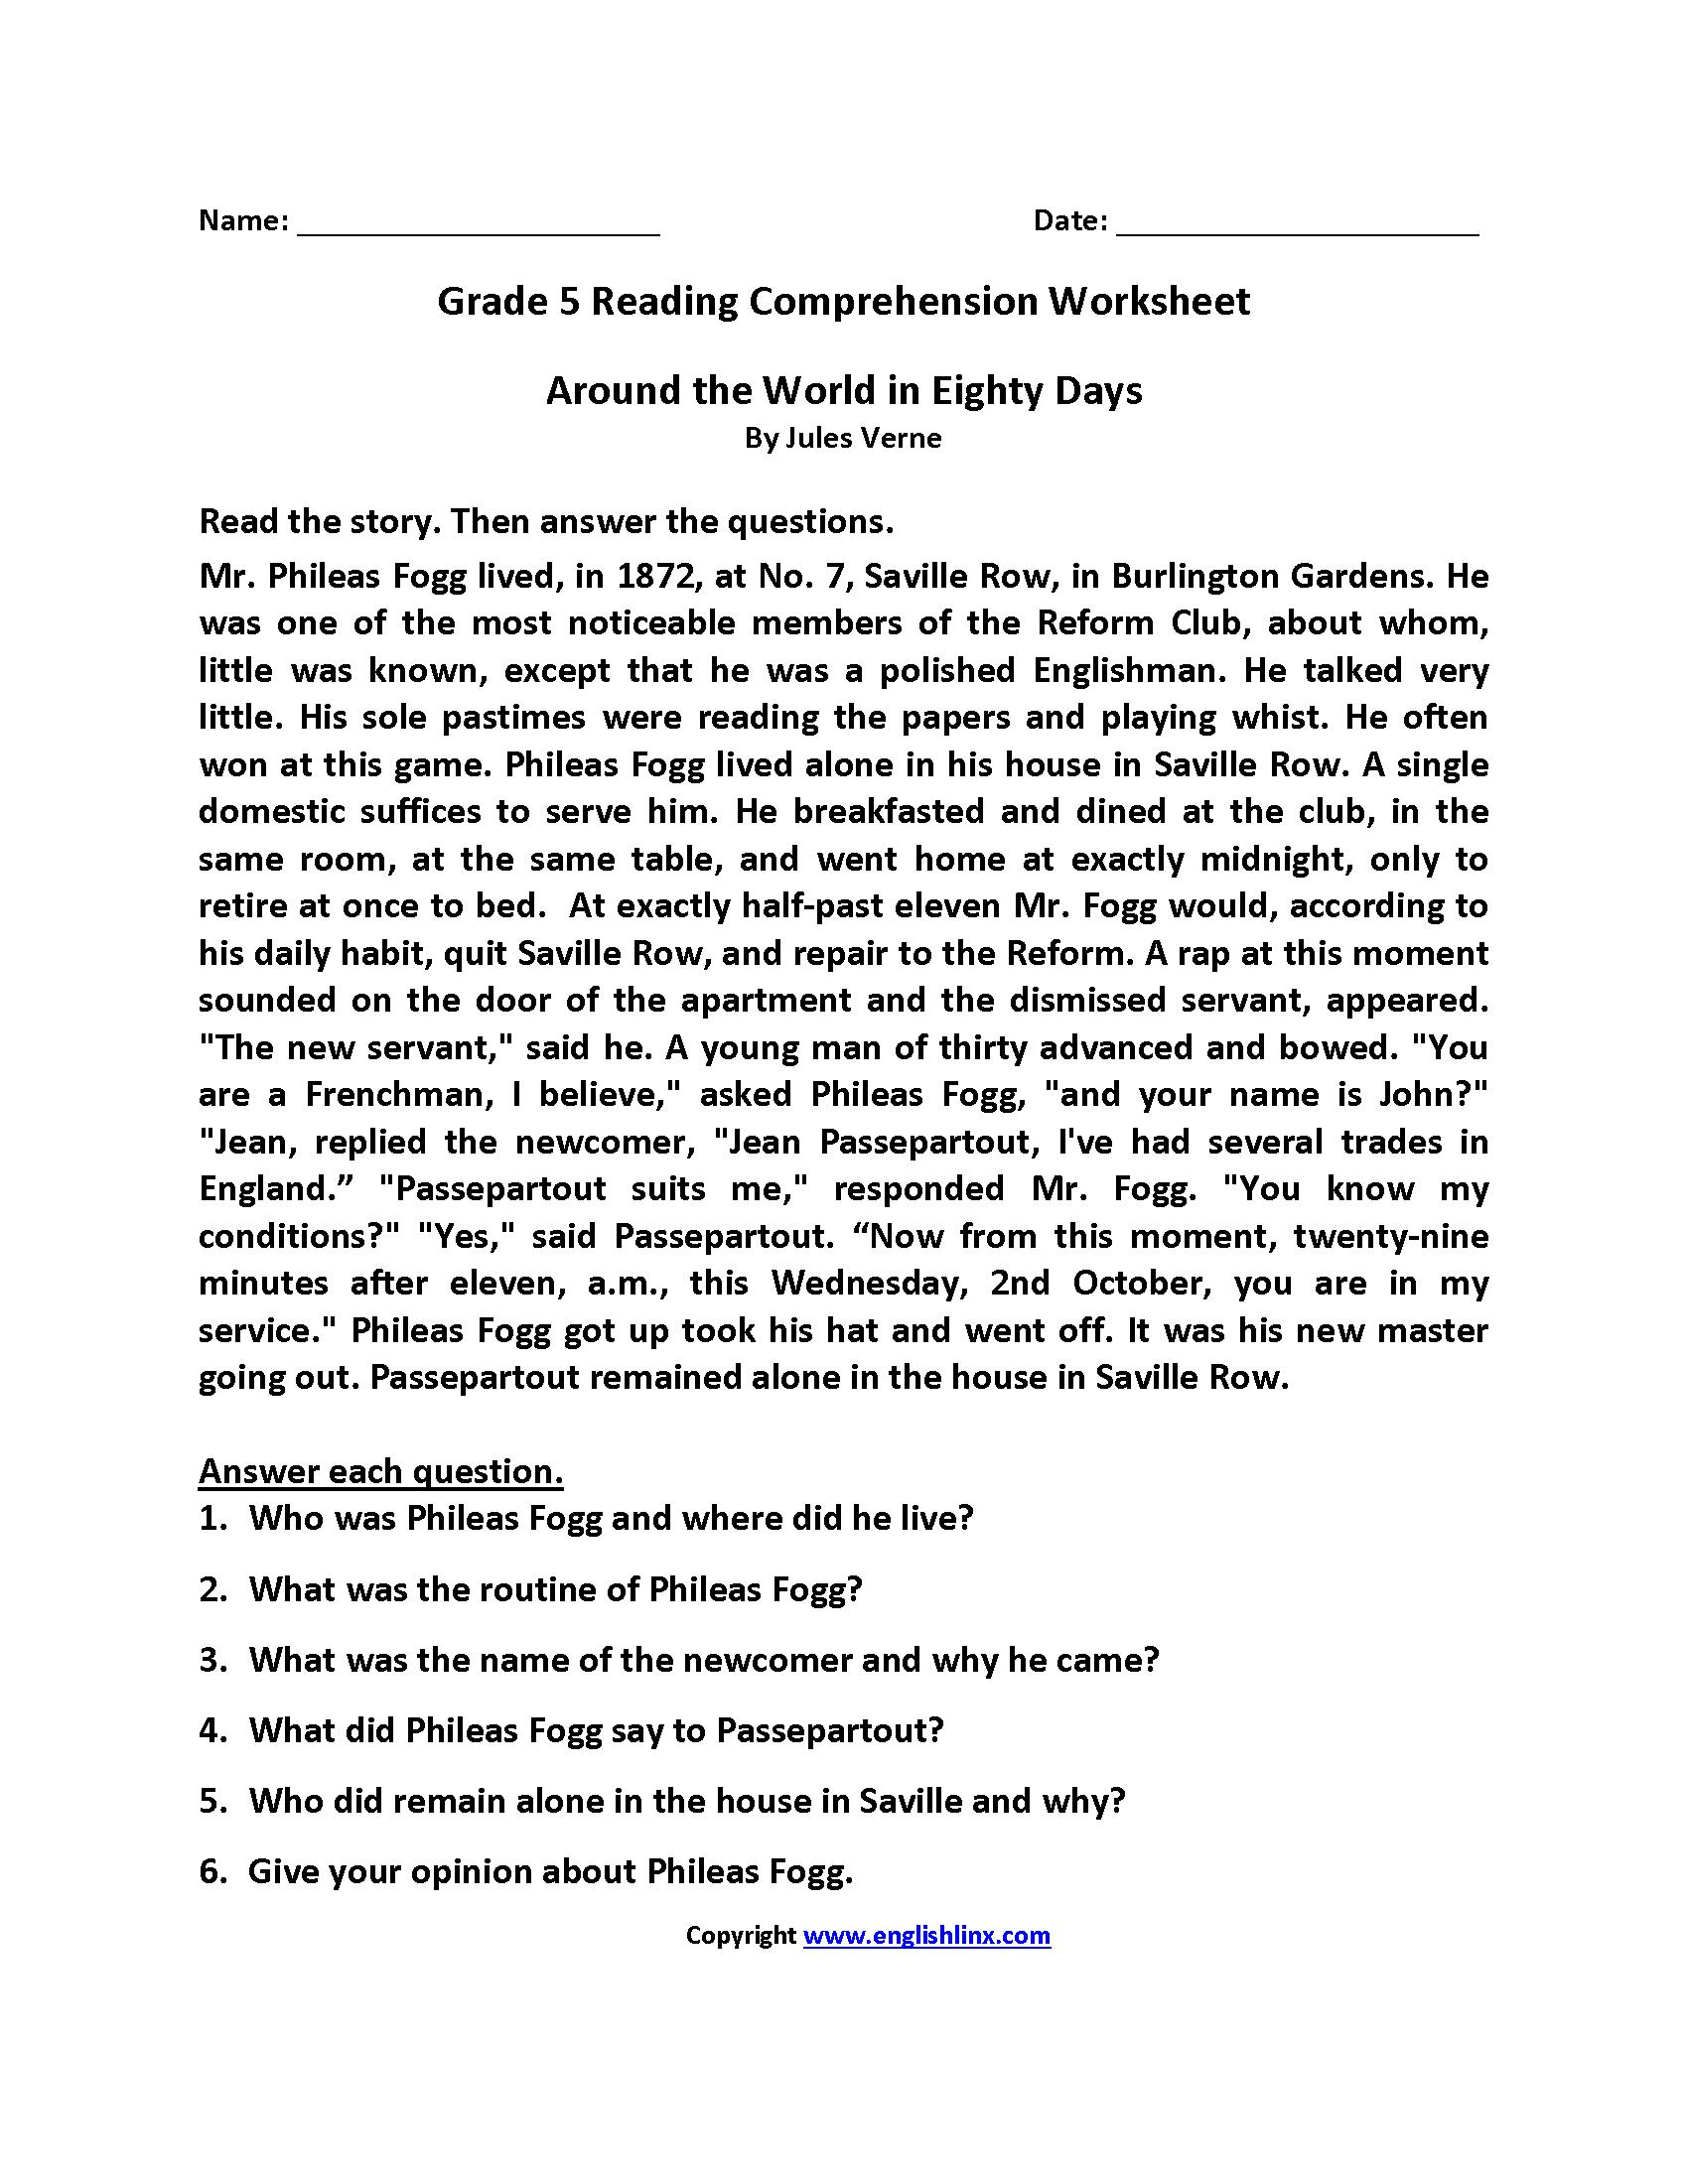 Reading Worksheets  Fifth Grade Reading Worksheets Together With Comprehension Worksheets For Grade 5